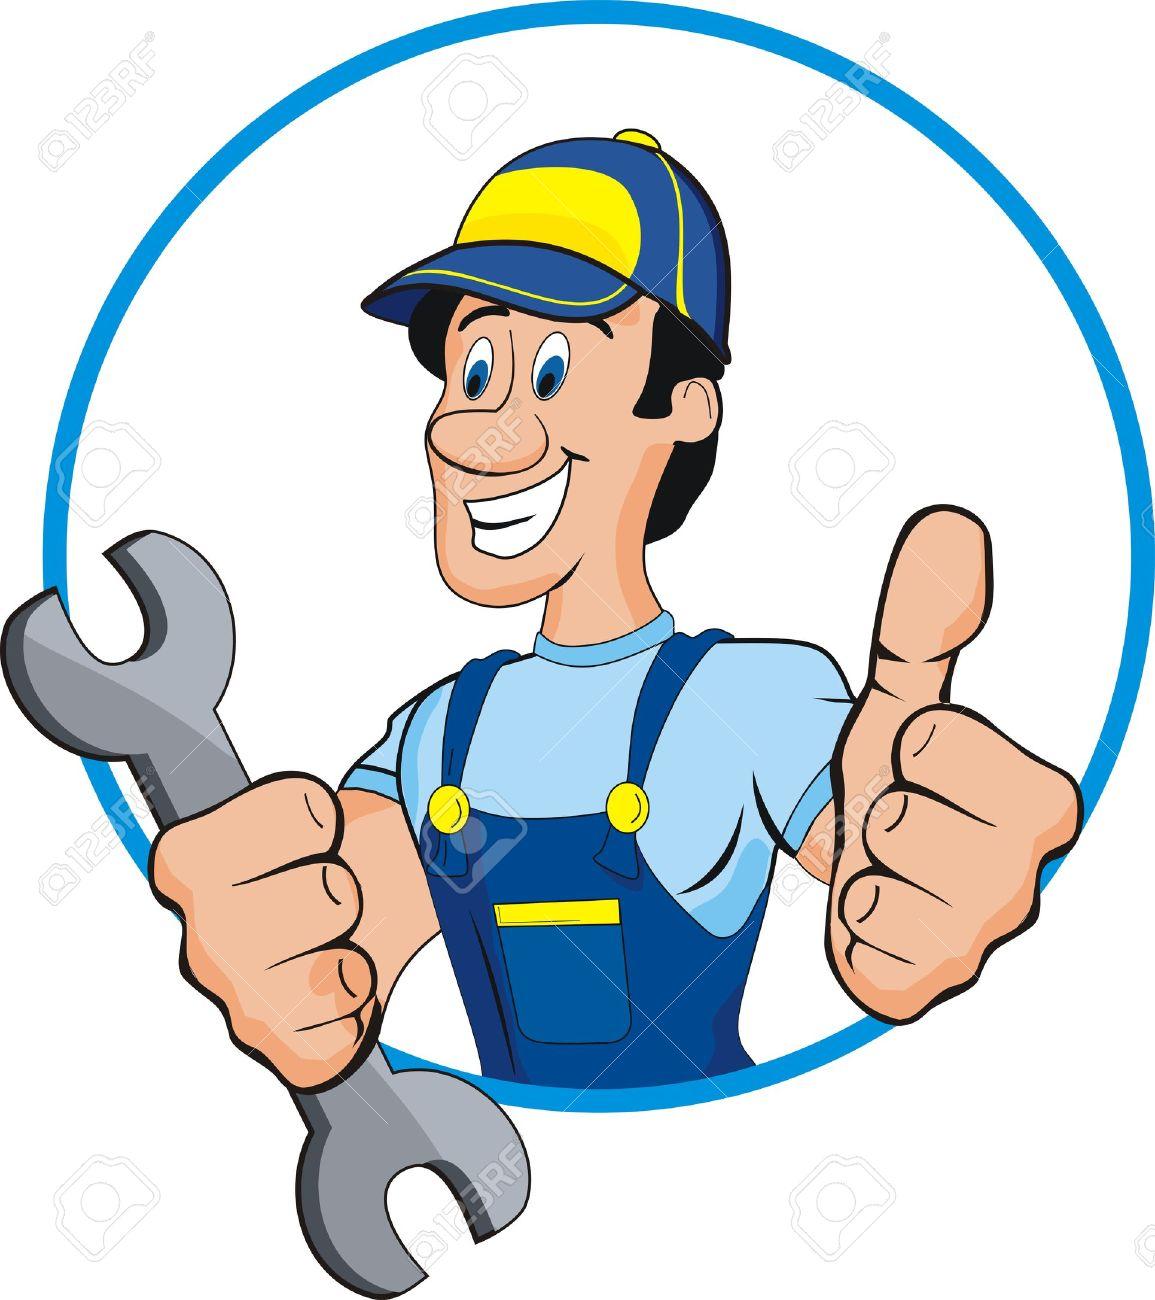 Cartoon mechanic with tools - 12497728